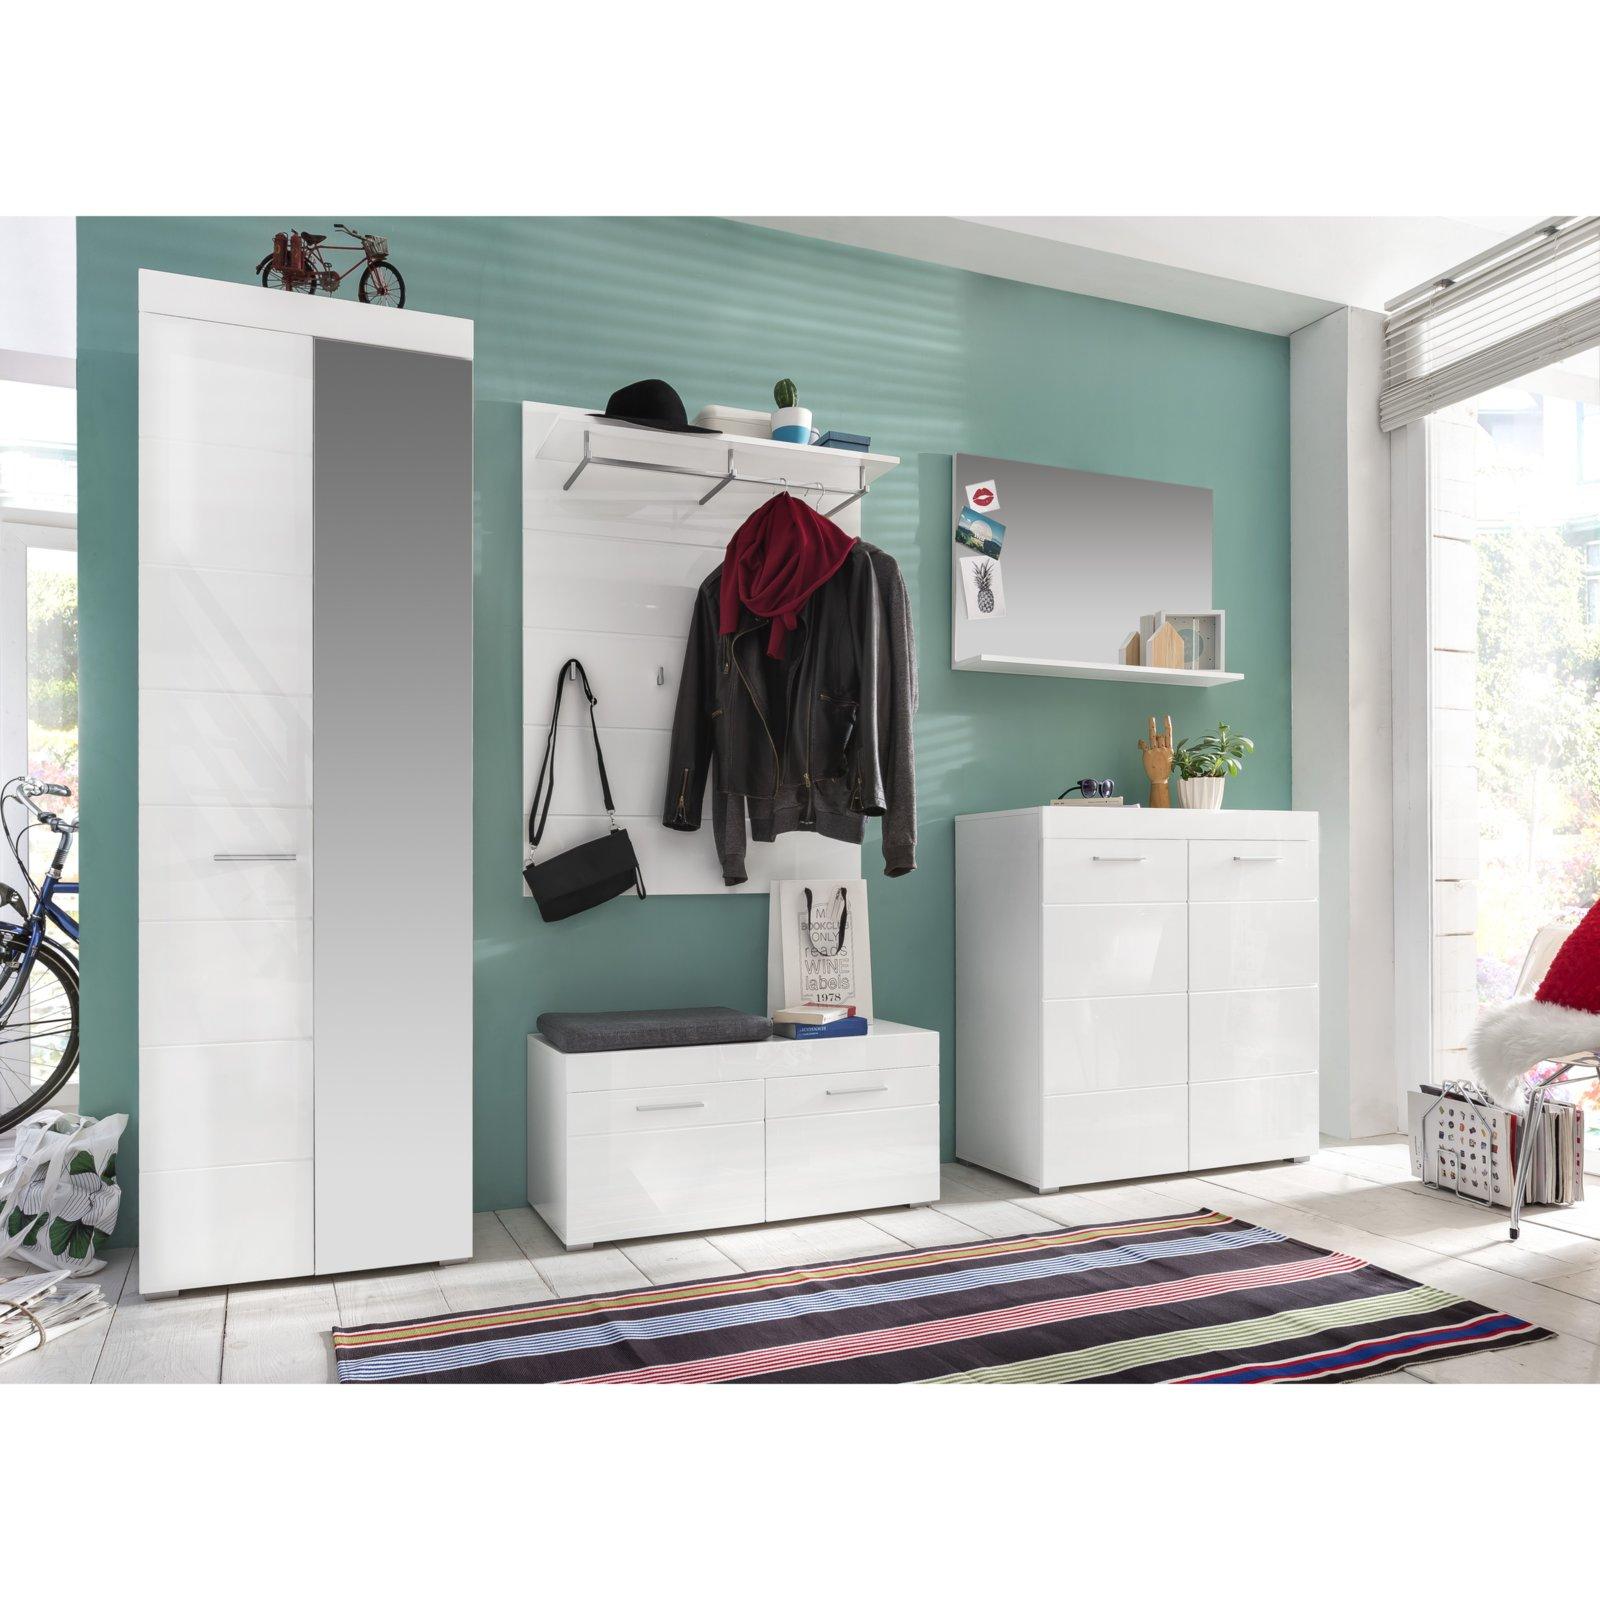 sitzbank amanda wei hochglanz 91 cm ebay. Black Bedroom Furniture Sets. Home Design Ideas